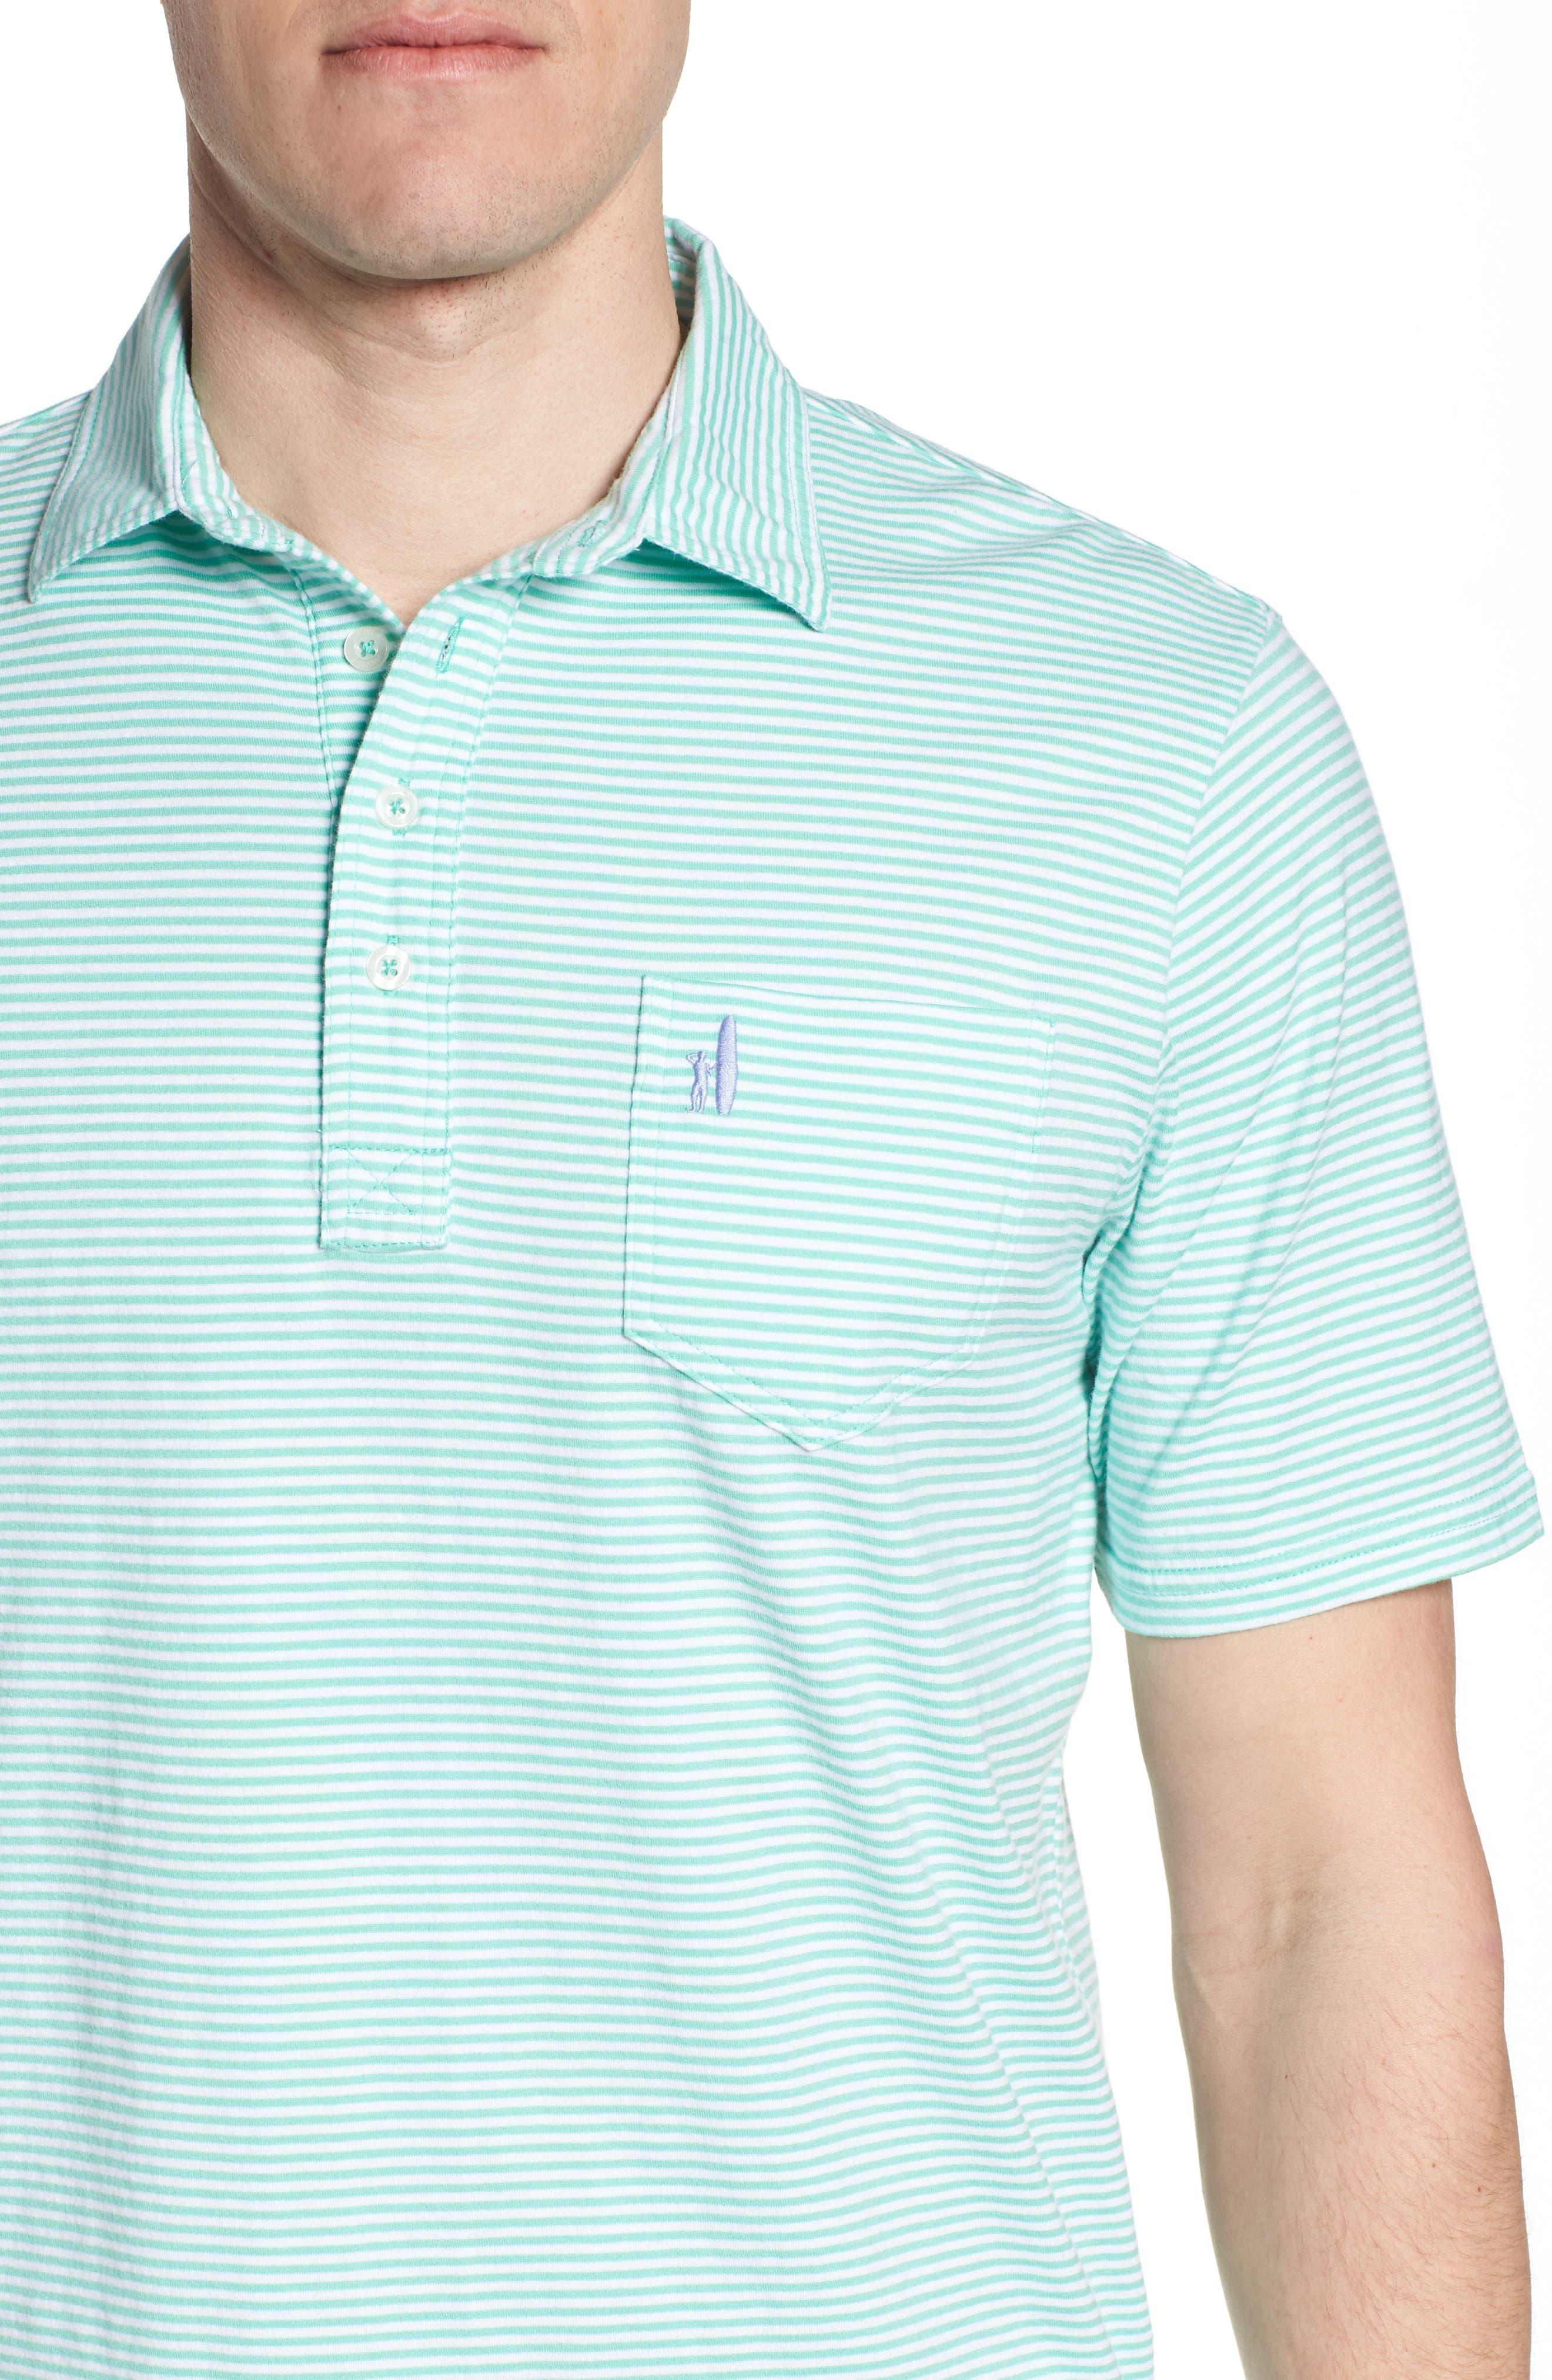 Jack Stripe Jersey Polo,                             Alternate thumbnail 4, color,                             Fern